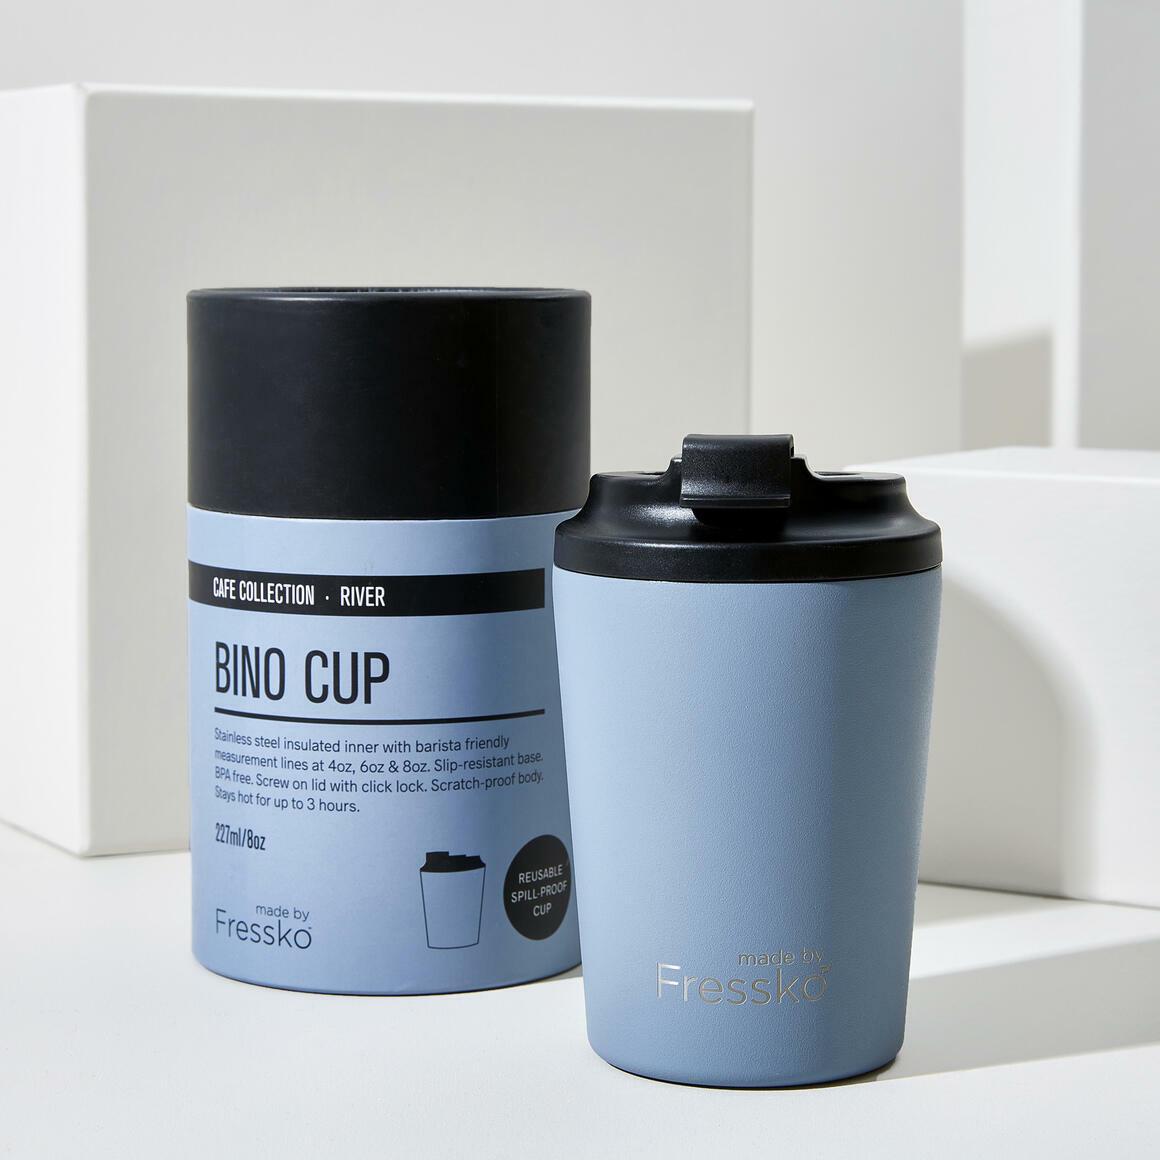 Fressko BINO 8oz Stainless Steel Reusable Cup BLUE | Trada Marketplace